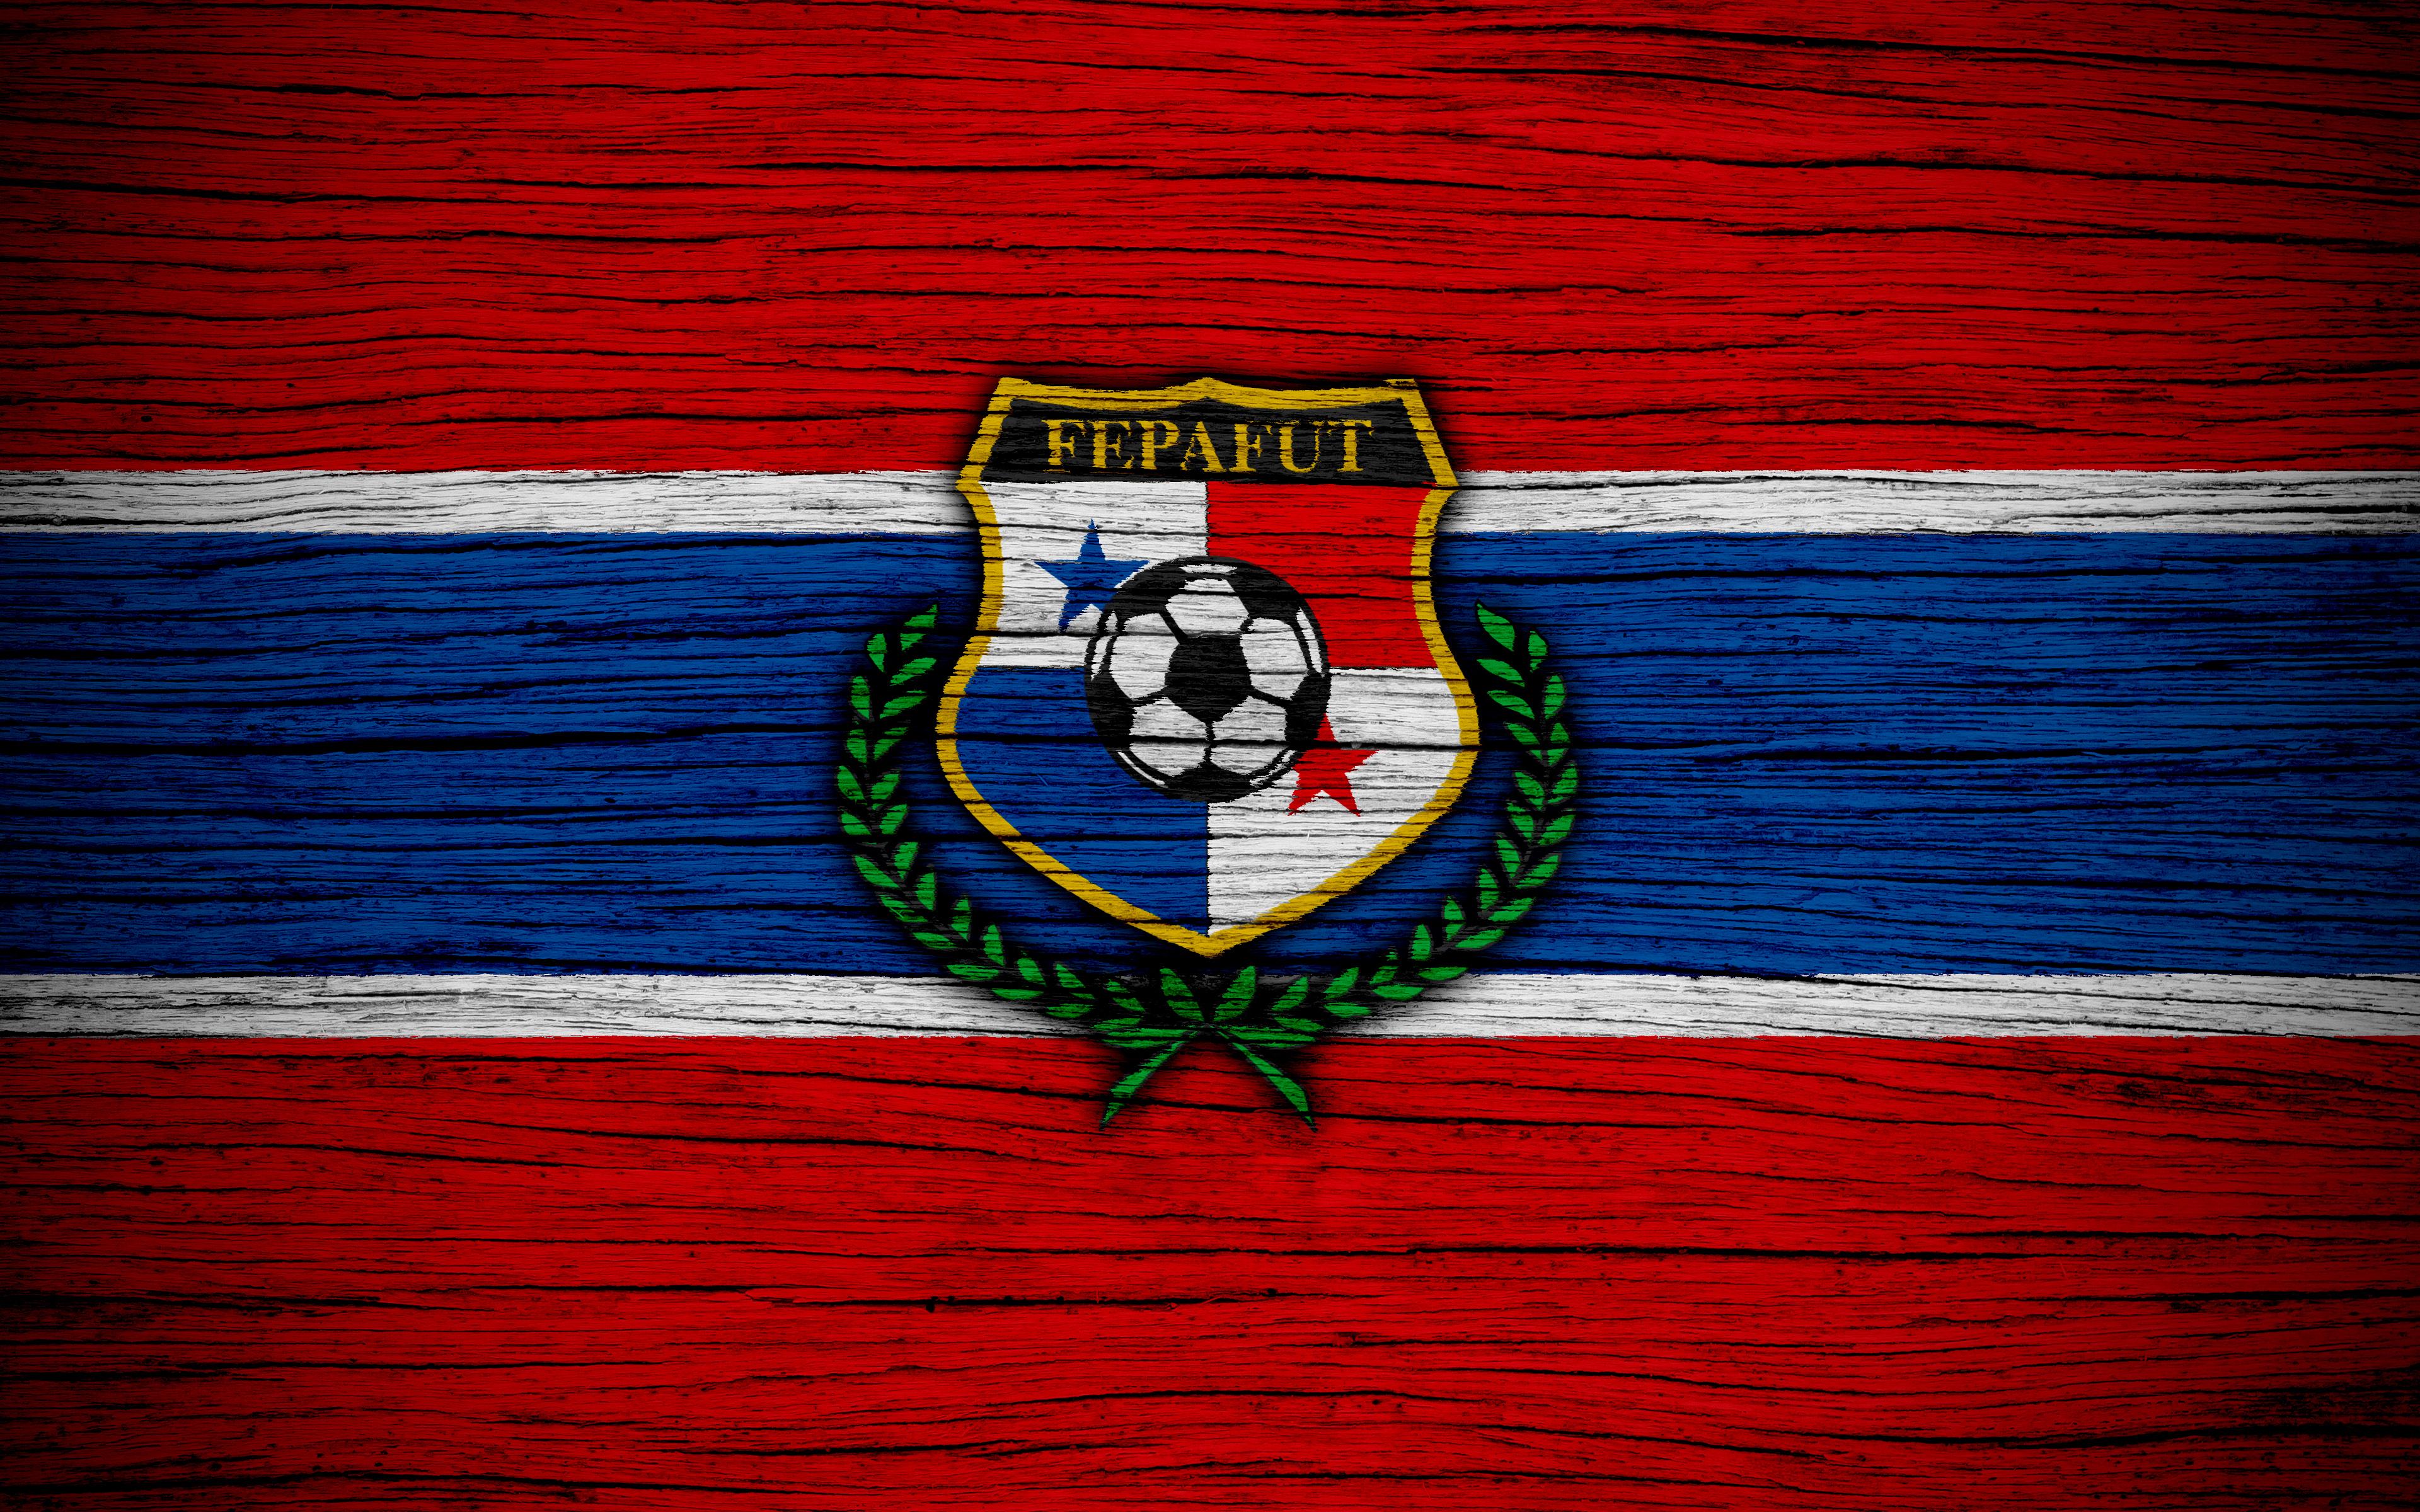 Panama National Football Team 4k Ultra HD Wallpaper | Background Image | 3840x2400 | ID:980031 - Wallpaper Abyss